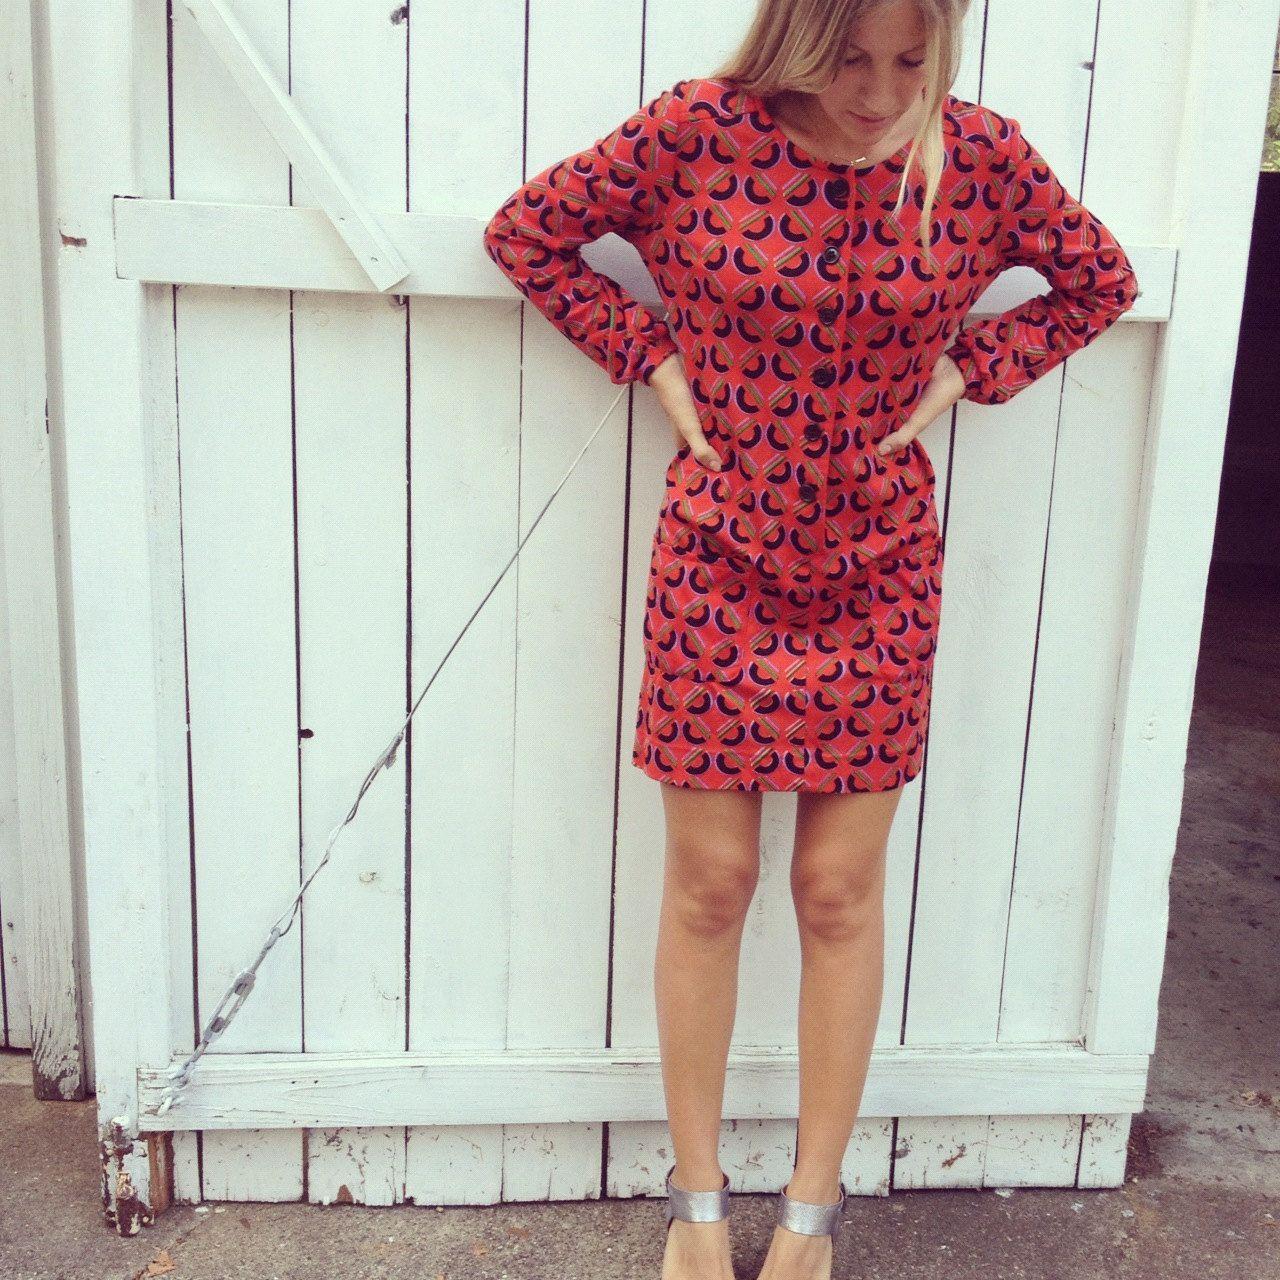 1960s 70s Retro Patterned Red Long Sleeve Shift Dress Mini Dress Extra Small Small 26 00 Via Etsy Long Sleeve Shift Dress Mini Shift Dress Shift Dress [ 1280 x 1280 Pixel ]